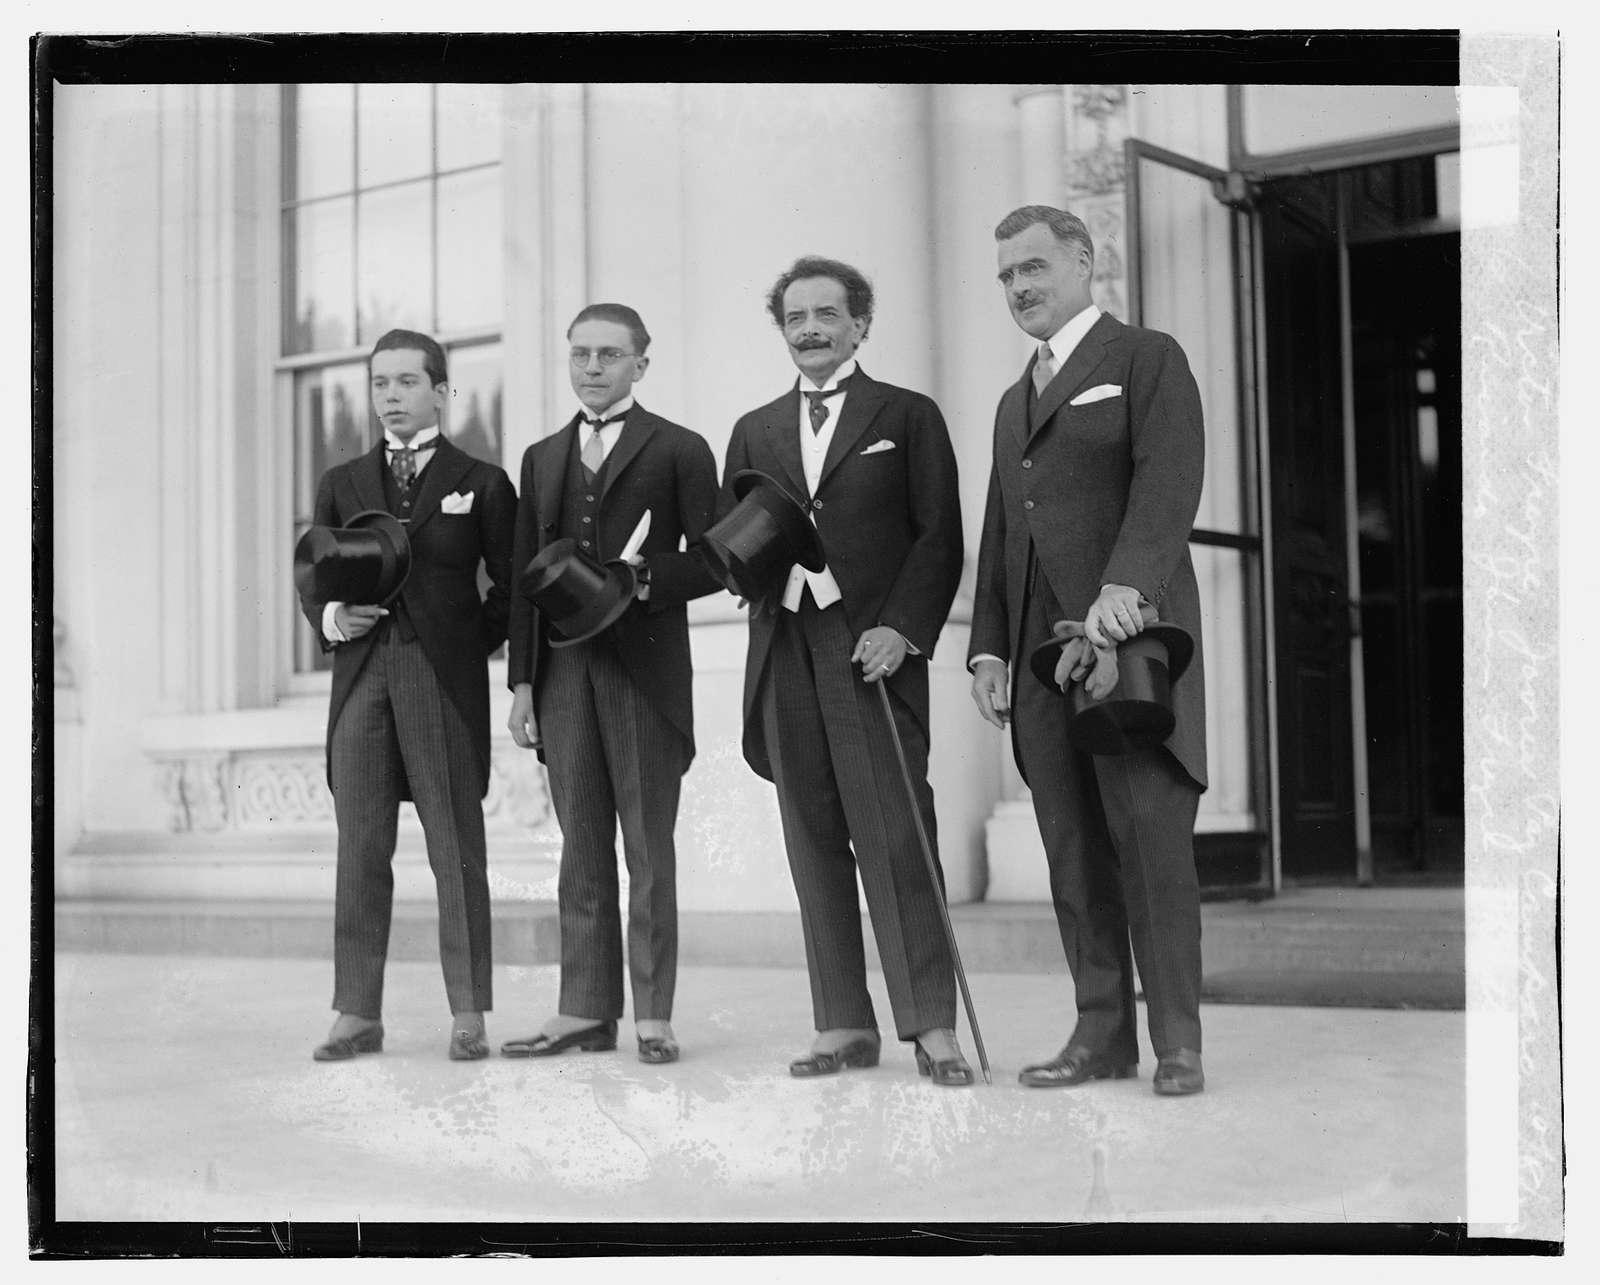 Victor Freyre, Javru Paz Camparo, Ricardo Jaimes Freyre, J.Butler Wright, 10823